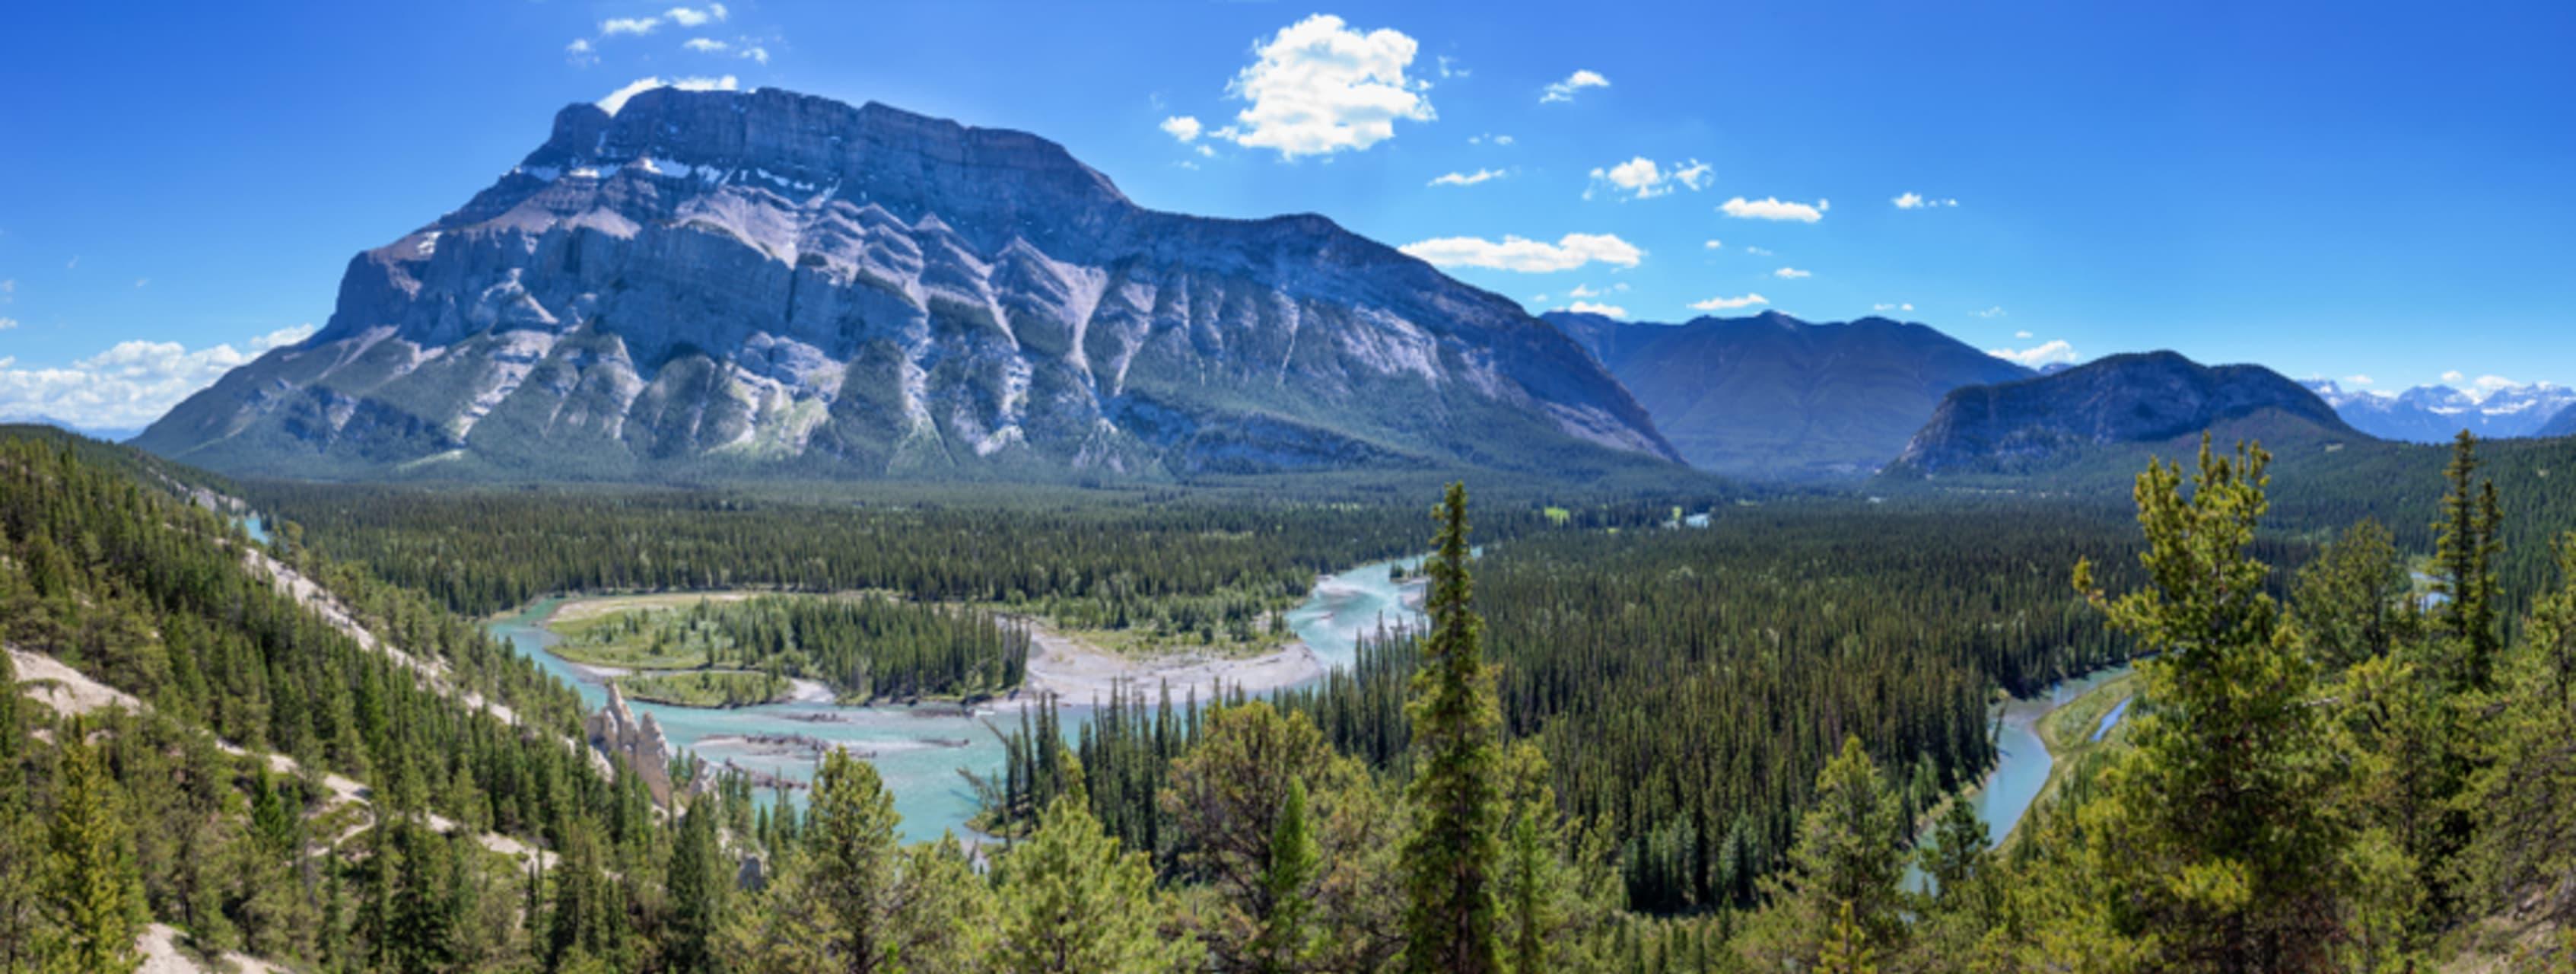 Banff - Tunnel Mountain Has No Tunnel